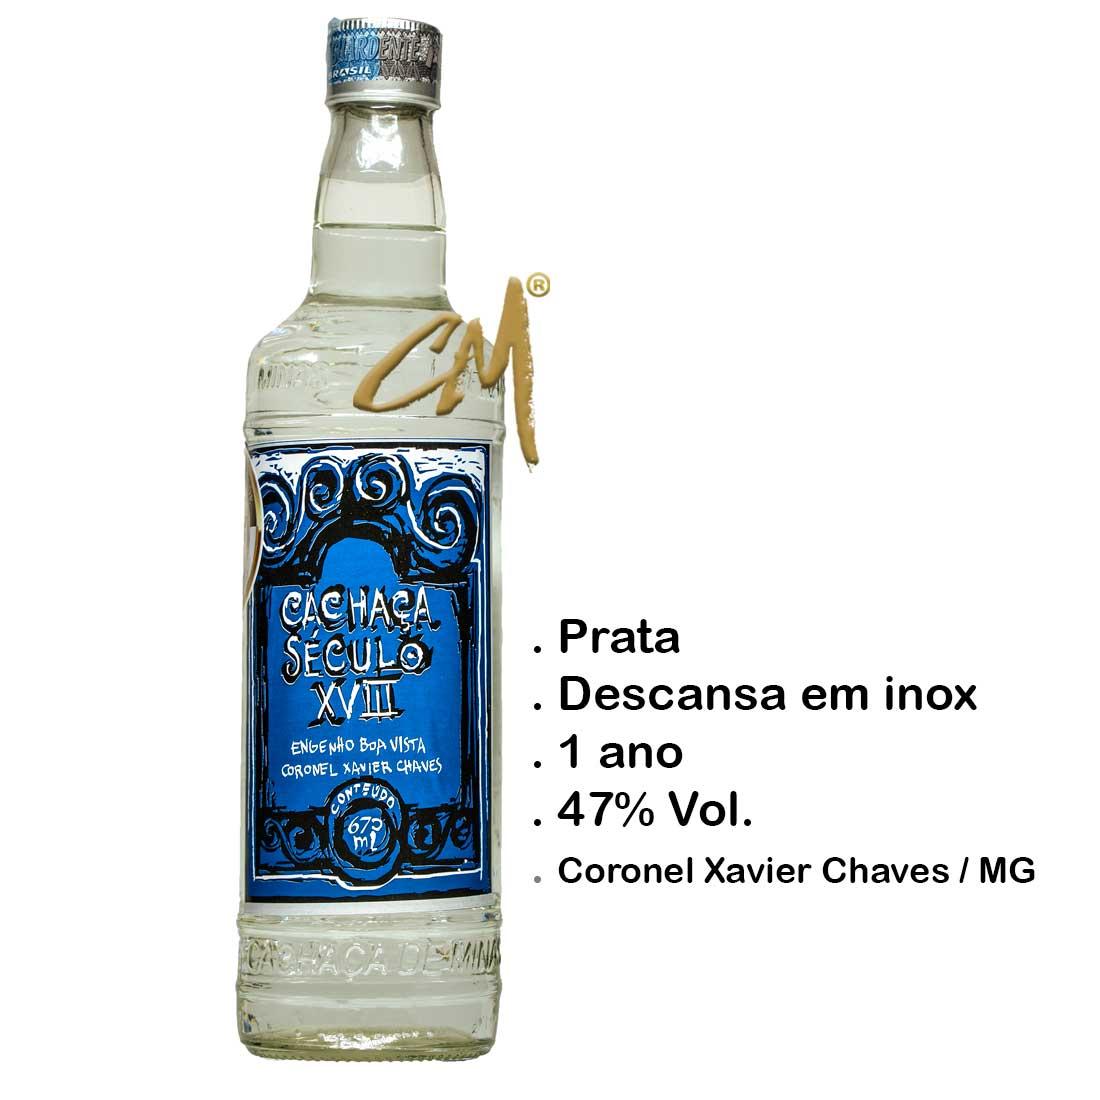 Cachaça Século XVIII 670 ml (Coronel Xavier Chaves - MG)